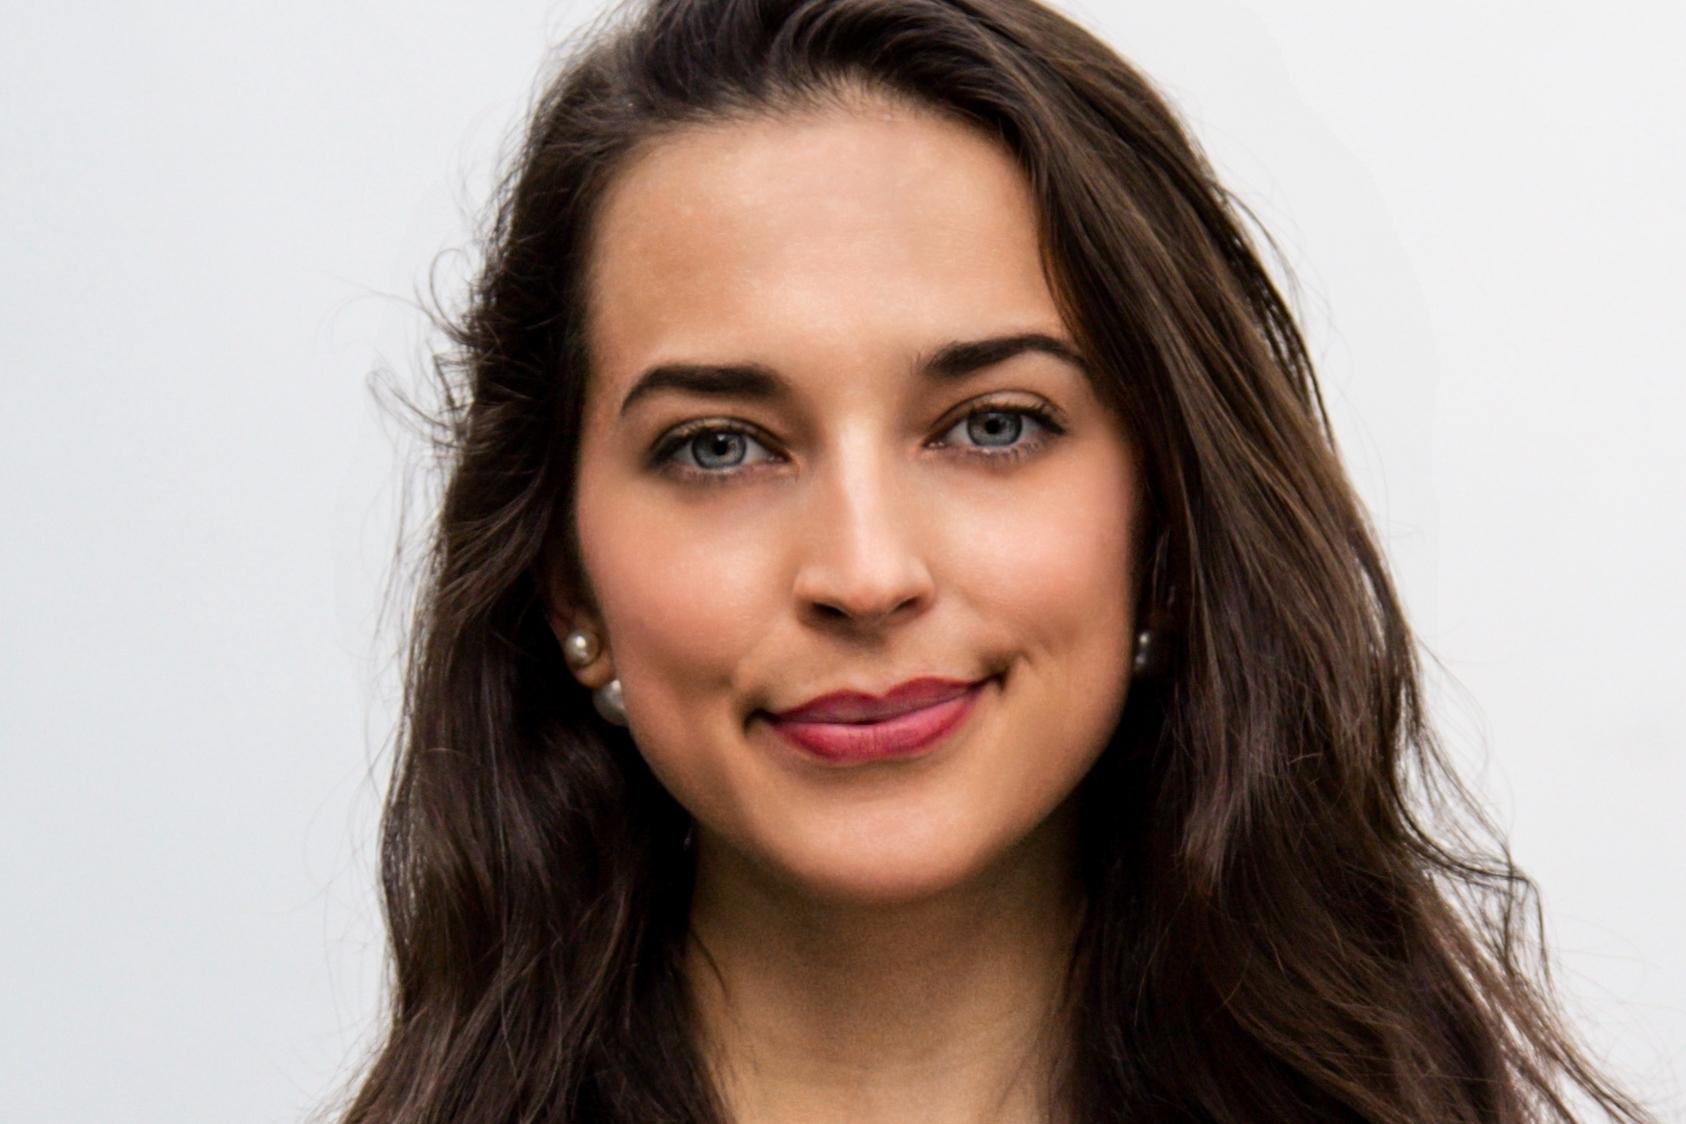 Rachel Sibley, Futurist and Marketing Strategist